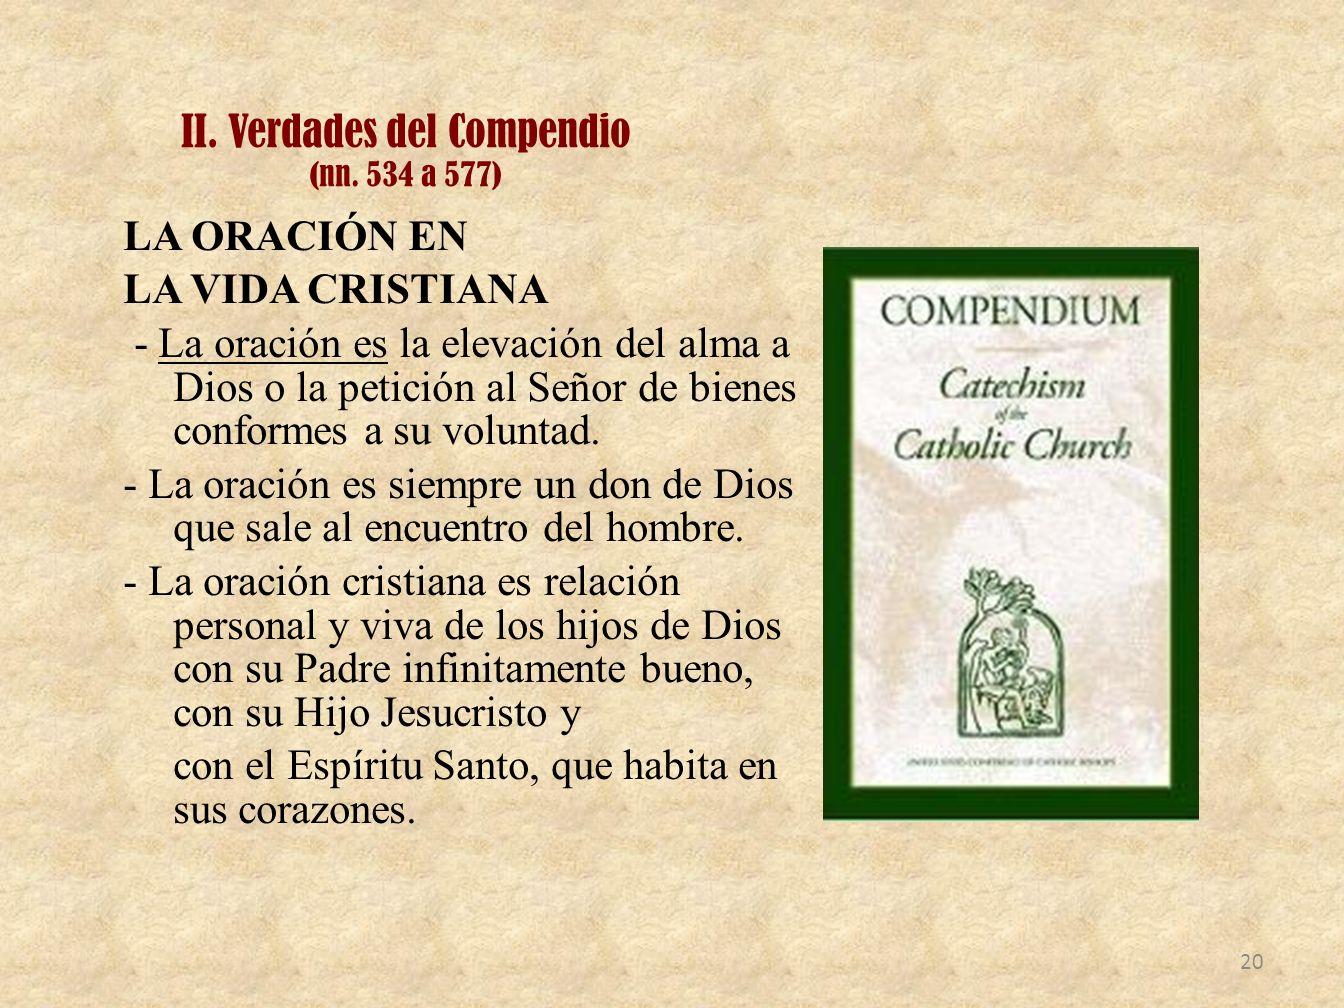 II. Verdades del Compendio (nn. 534 a 577)